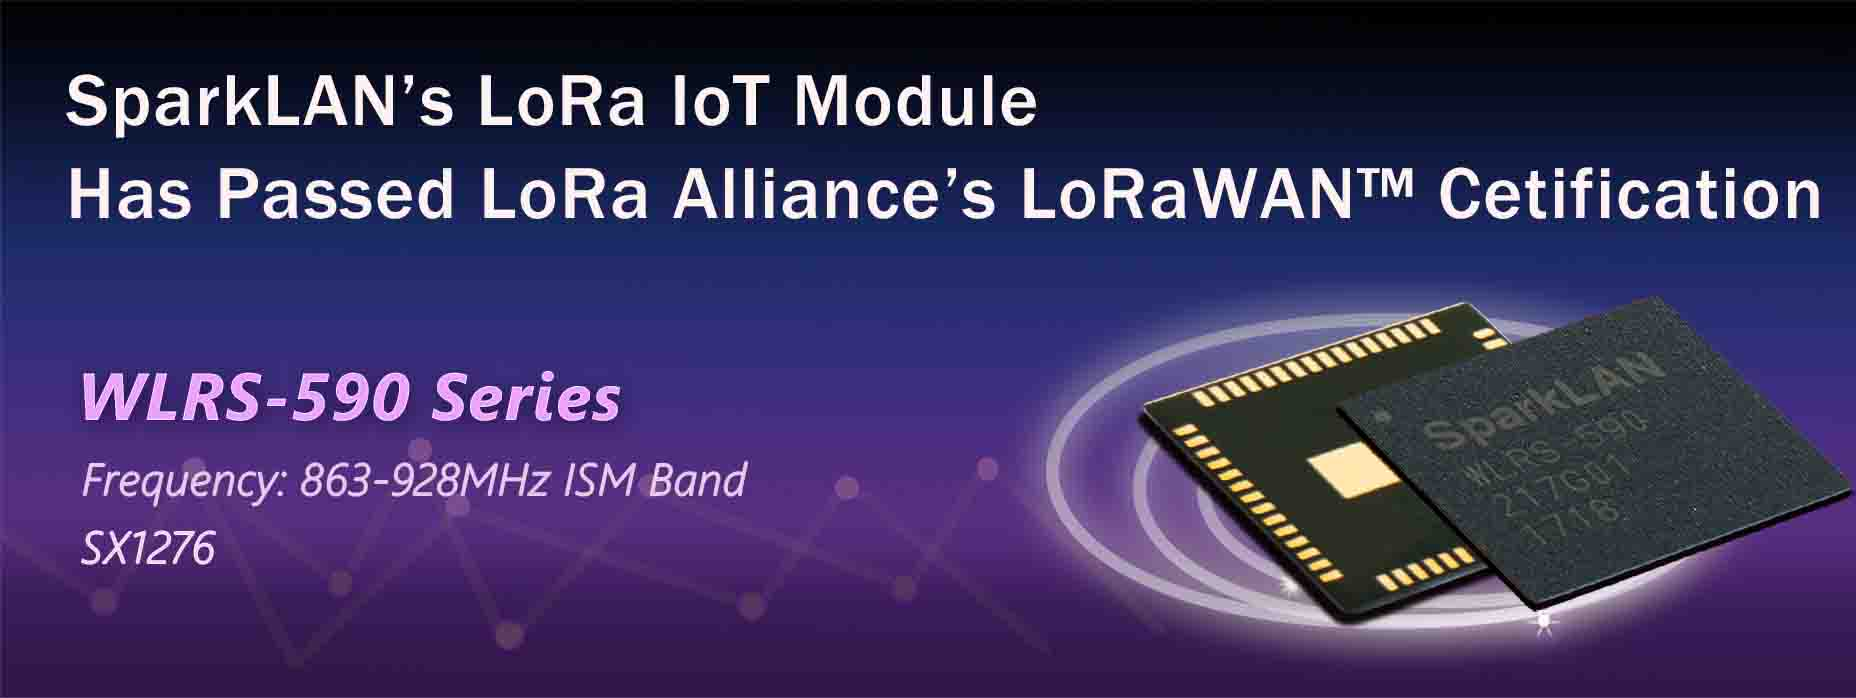 SparkLAN's LoRa IoT Module has Passed LoRa Alliance's